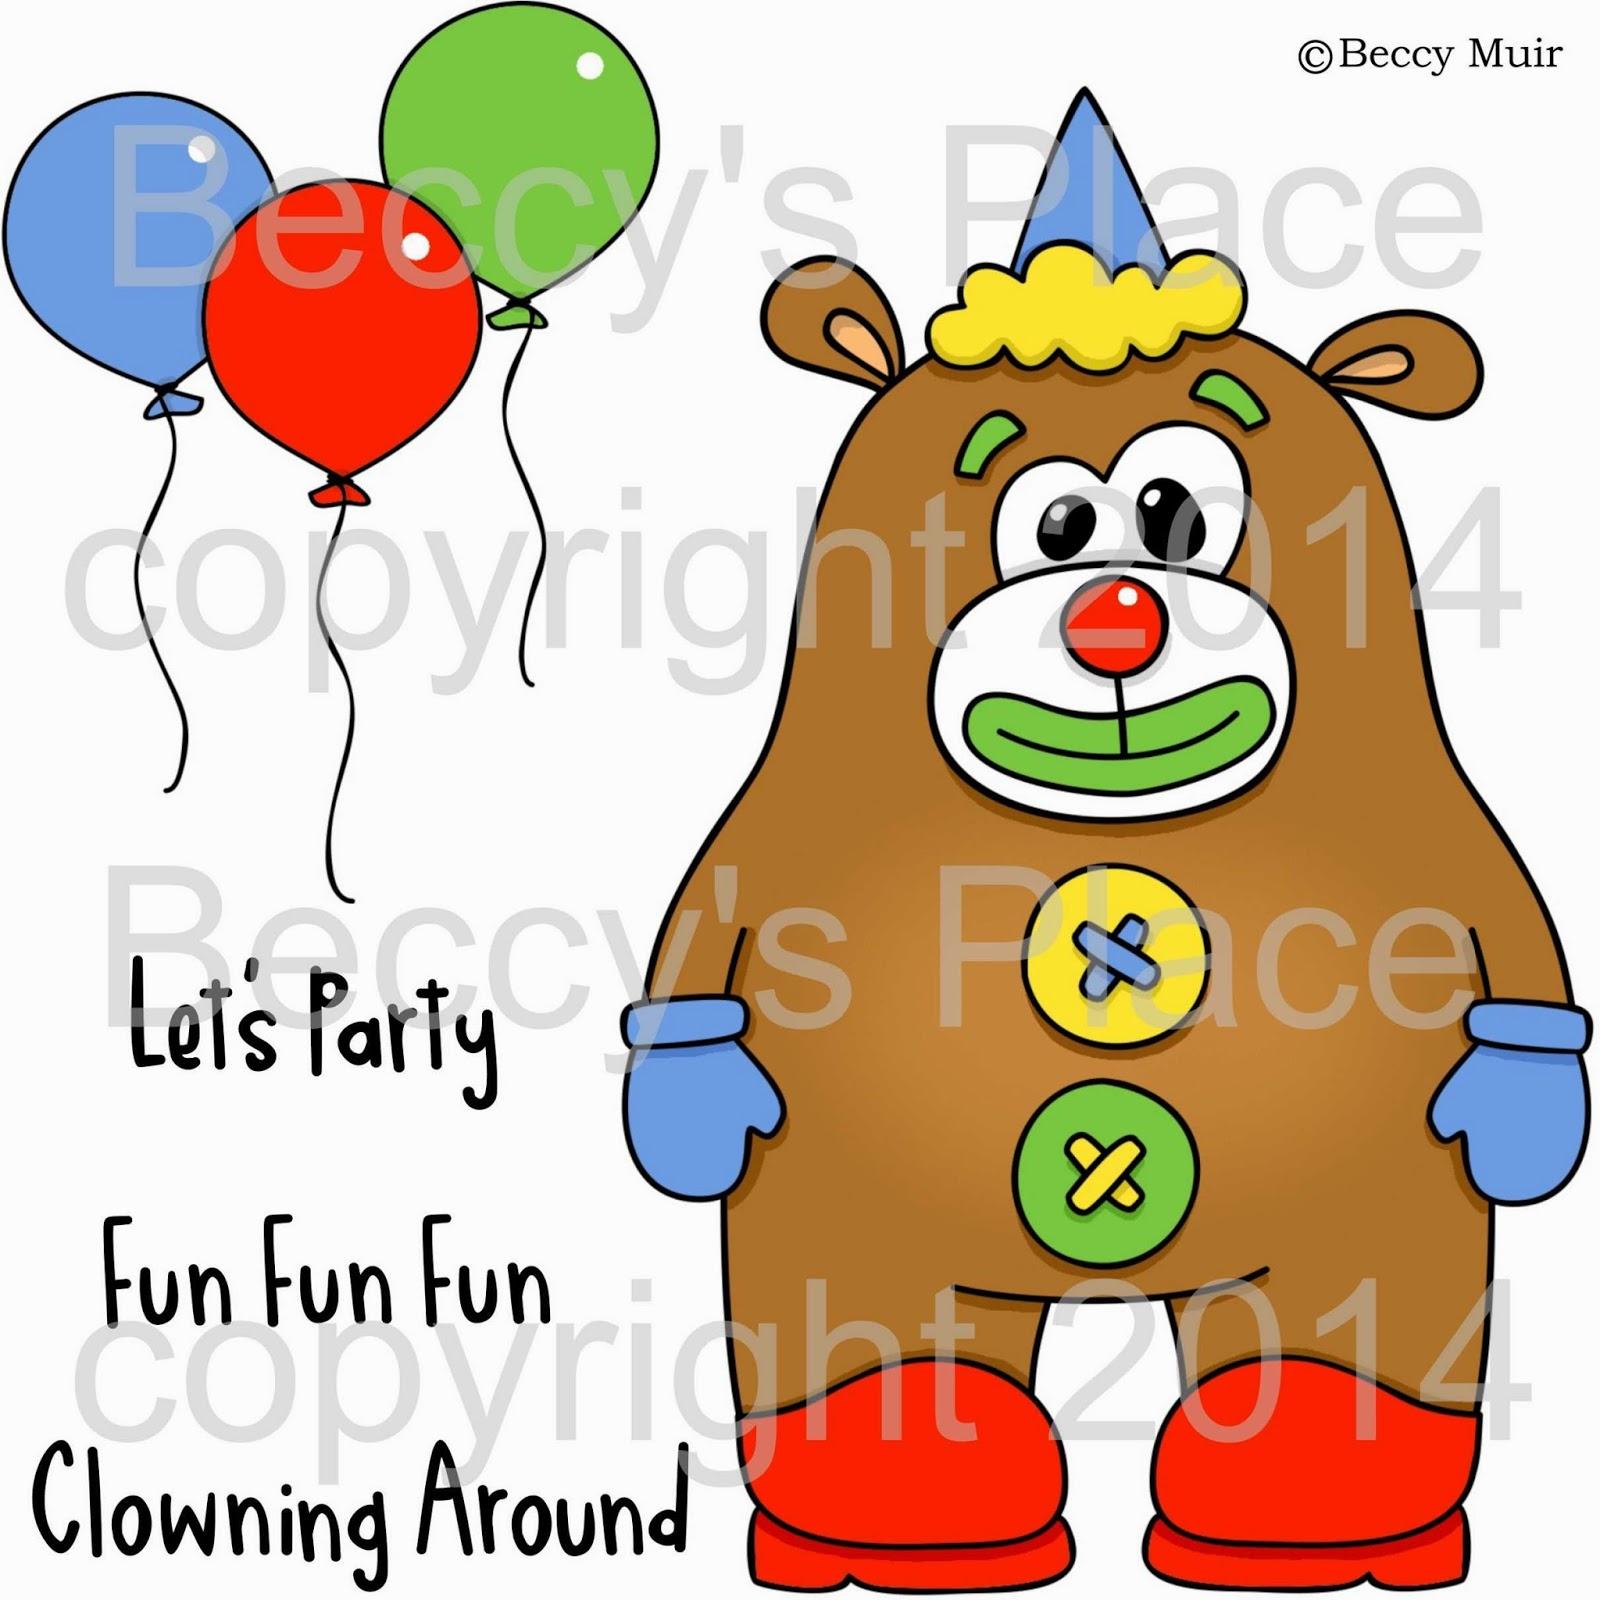 http://beccysplace.blogspot.com/2014/05/stanley-clown.html#comment-form